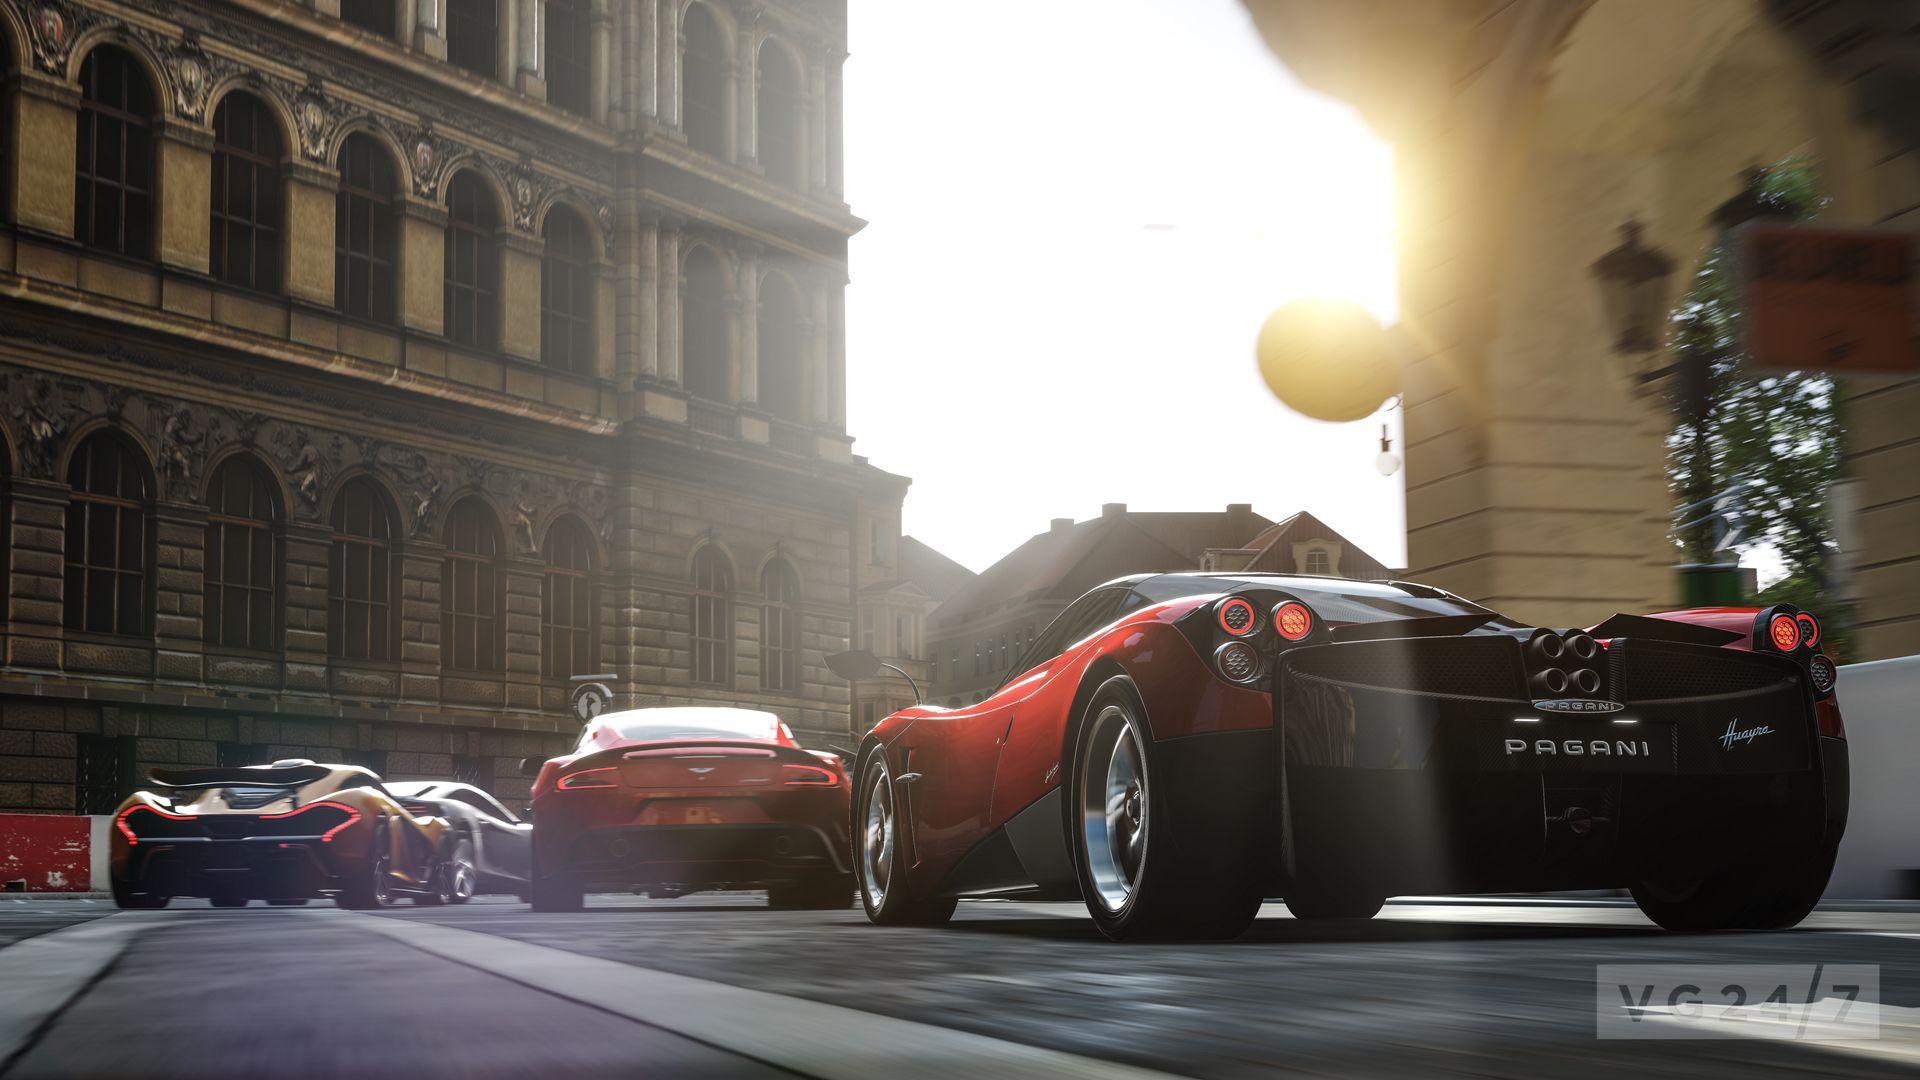 Forza5 Forza motorsport, Forza, Motorsport